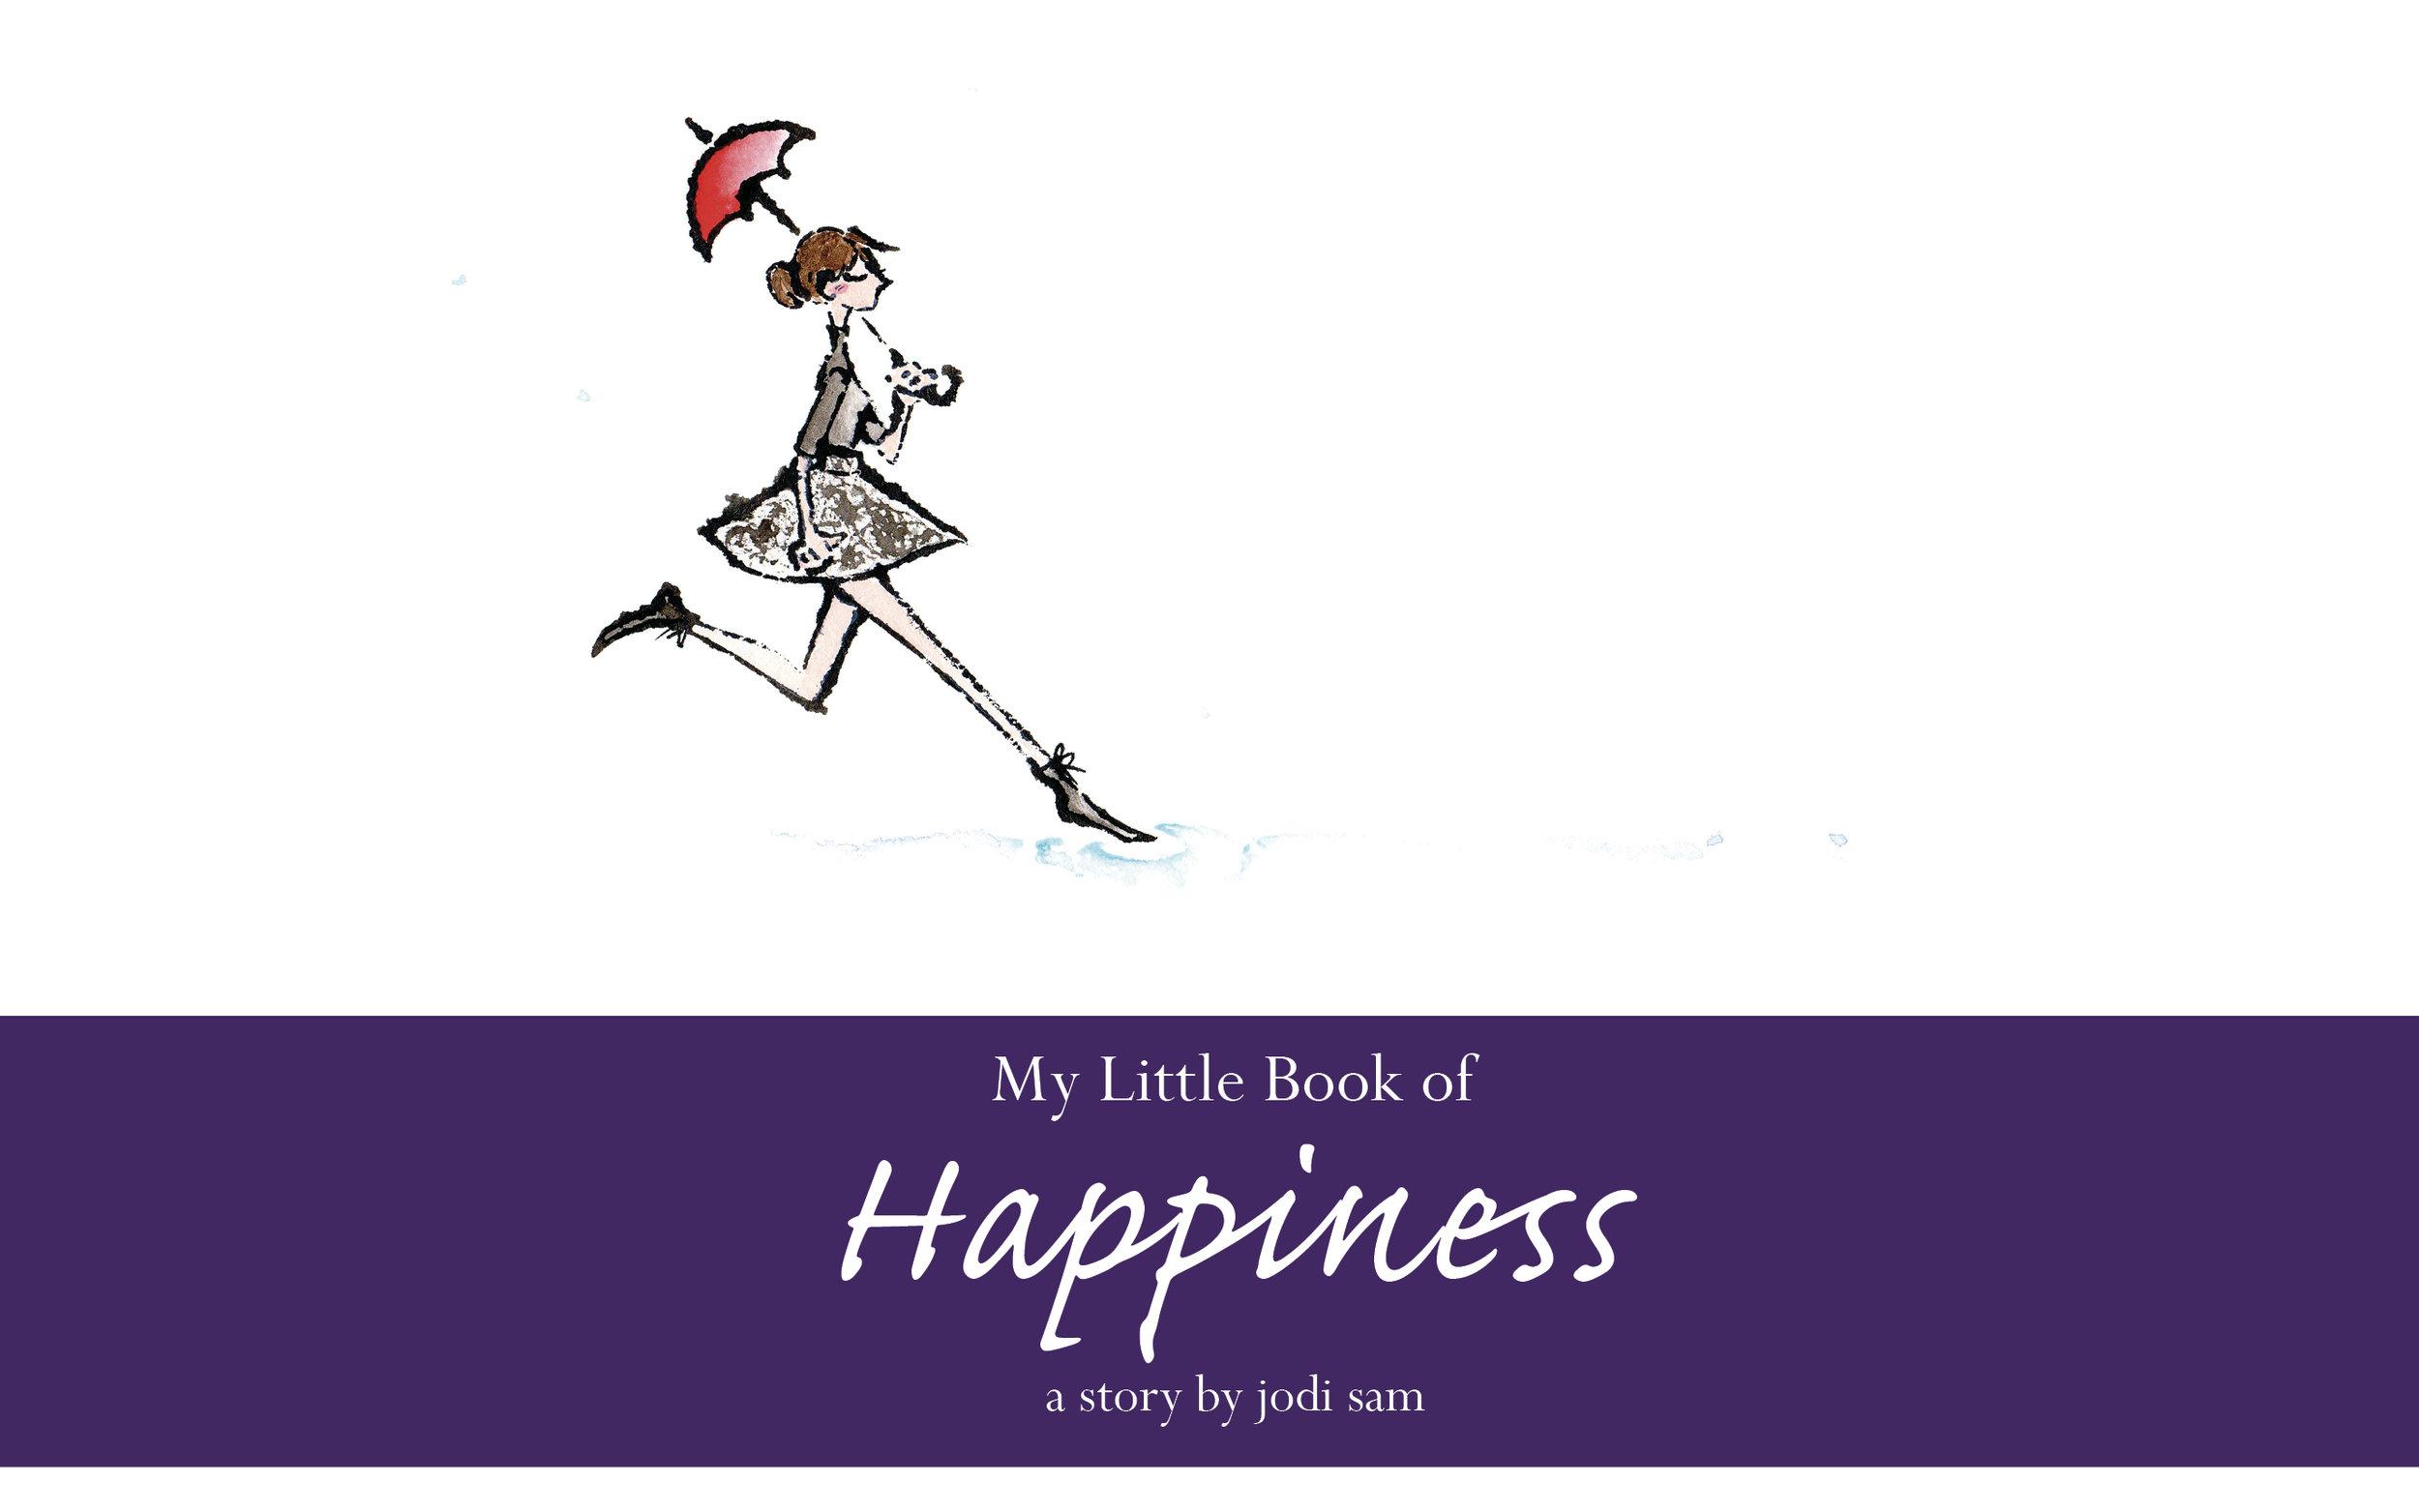 my little book of happiness_jodi sam_2017_forkindle.jpg